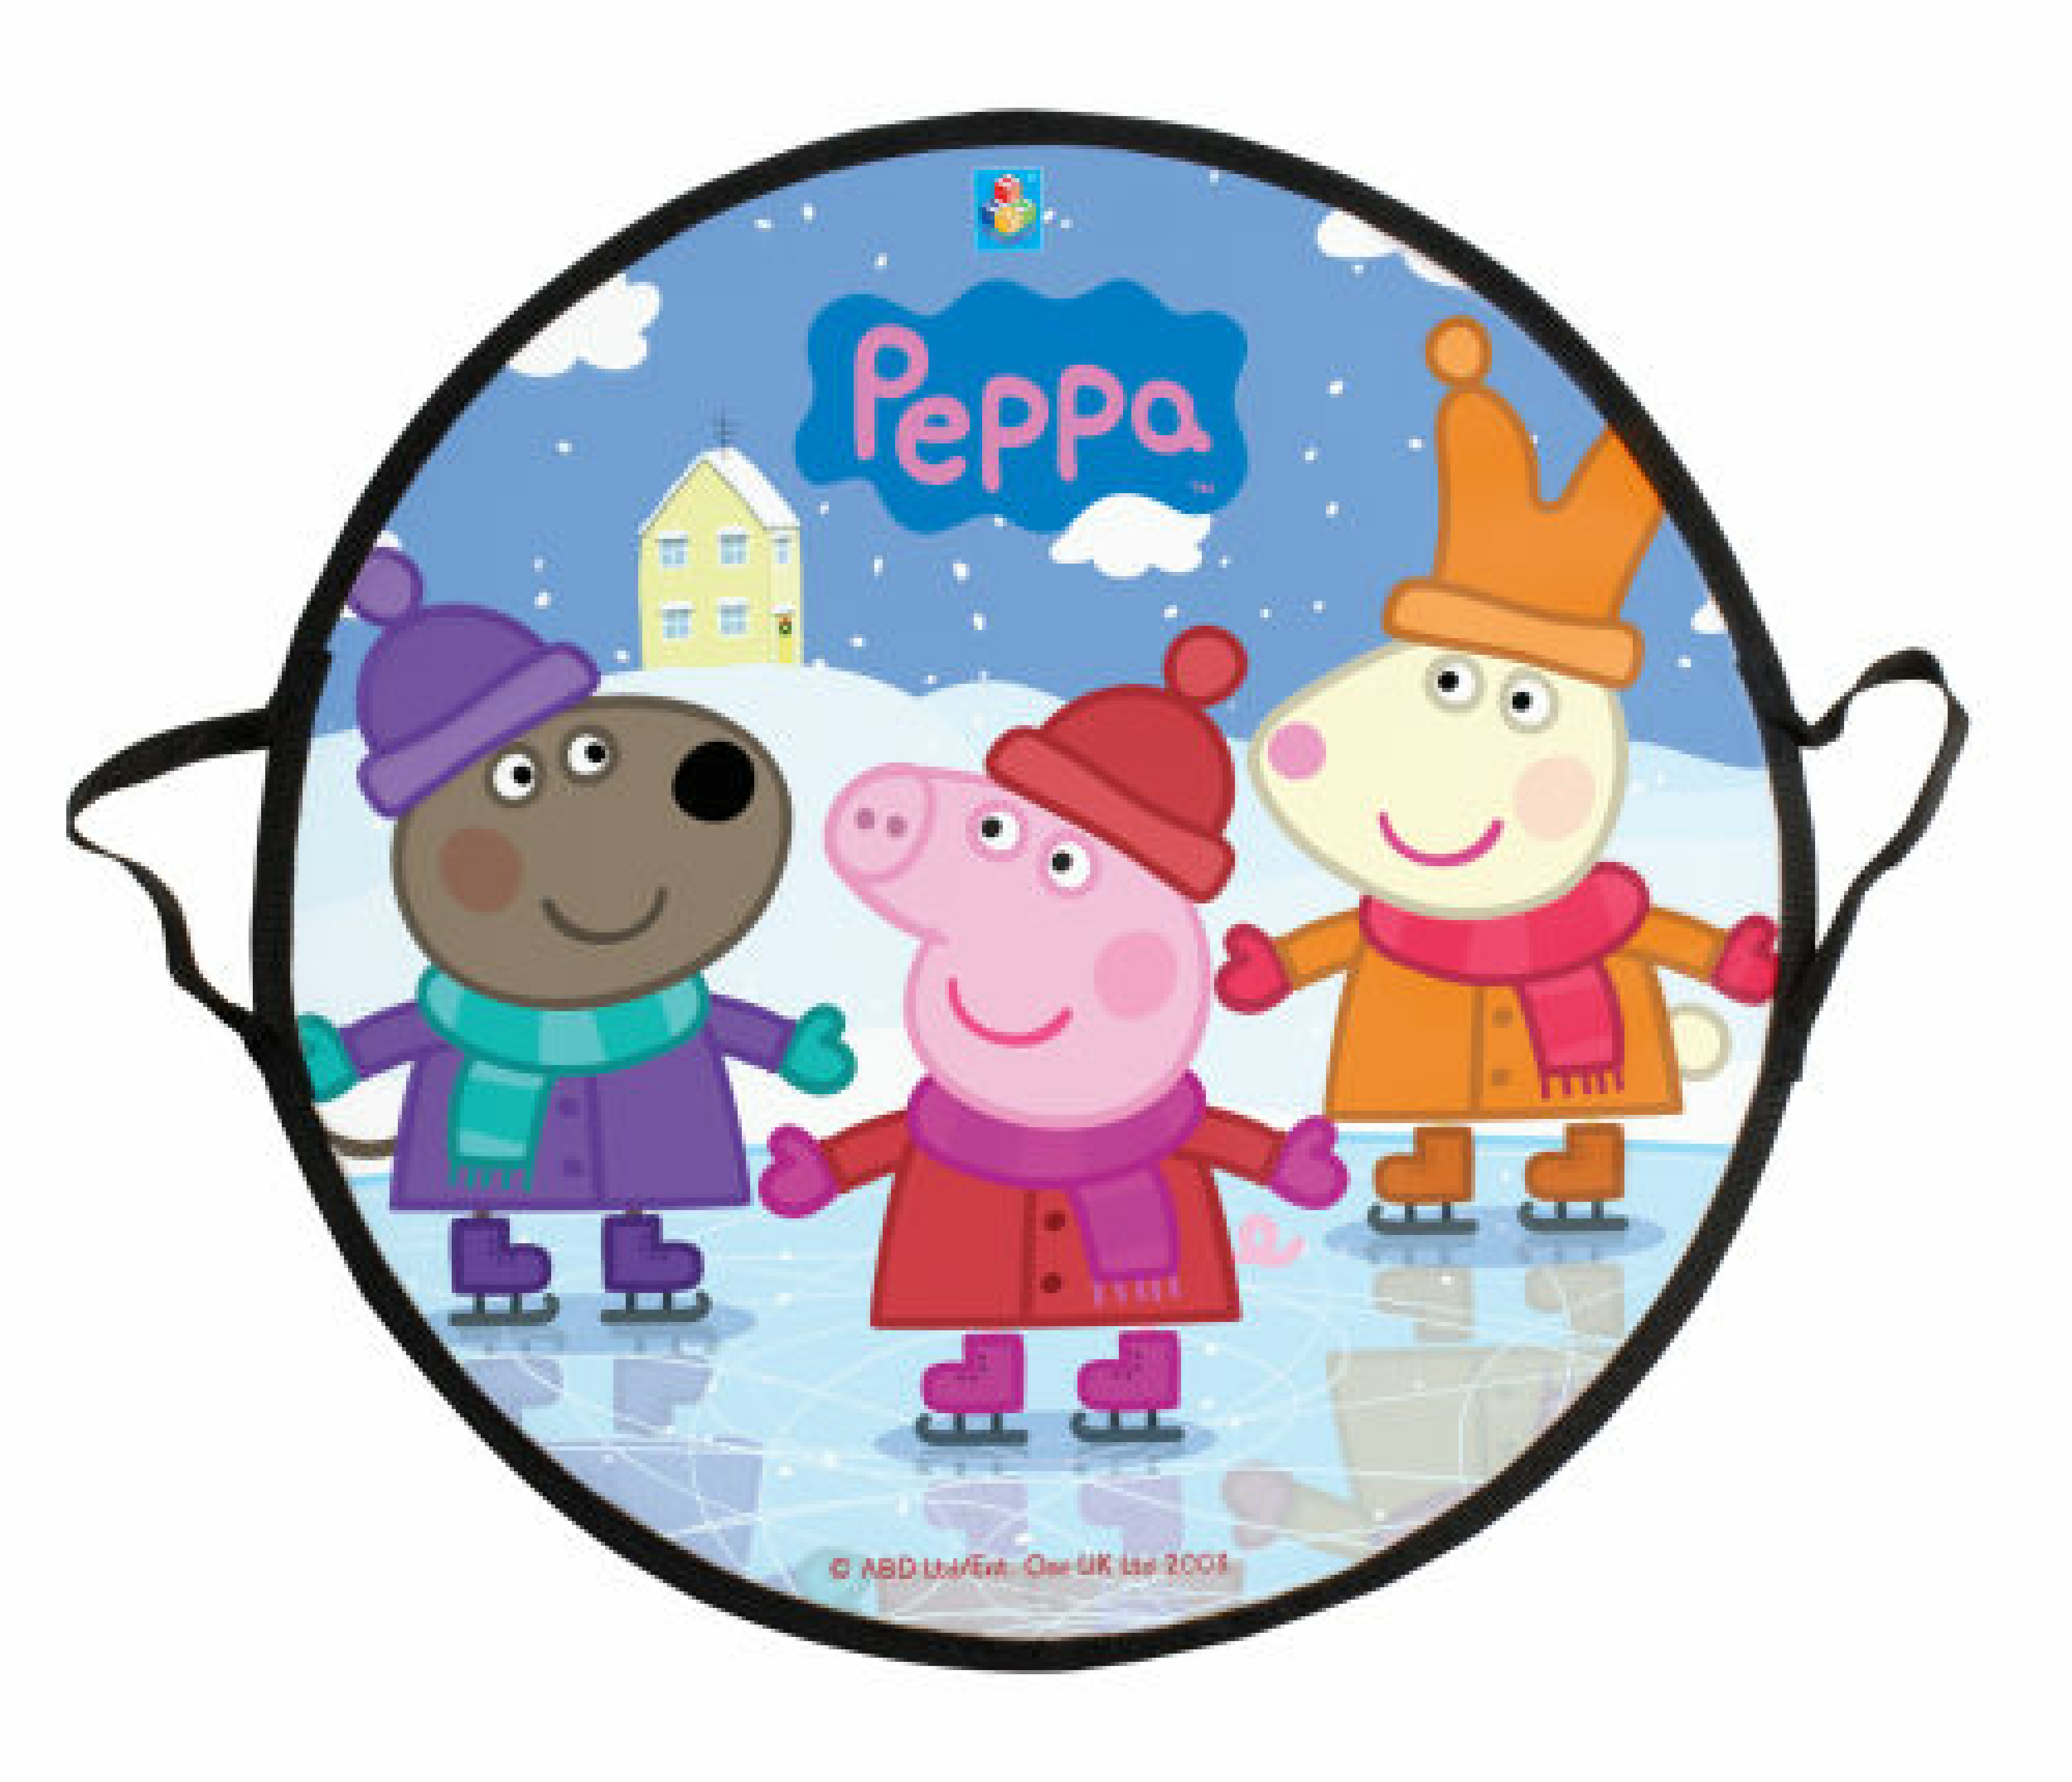 Peppa Pig ледянка 52 см круглая Disney Т58470